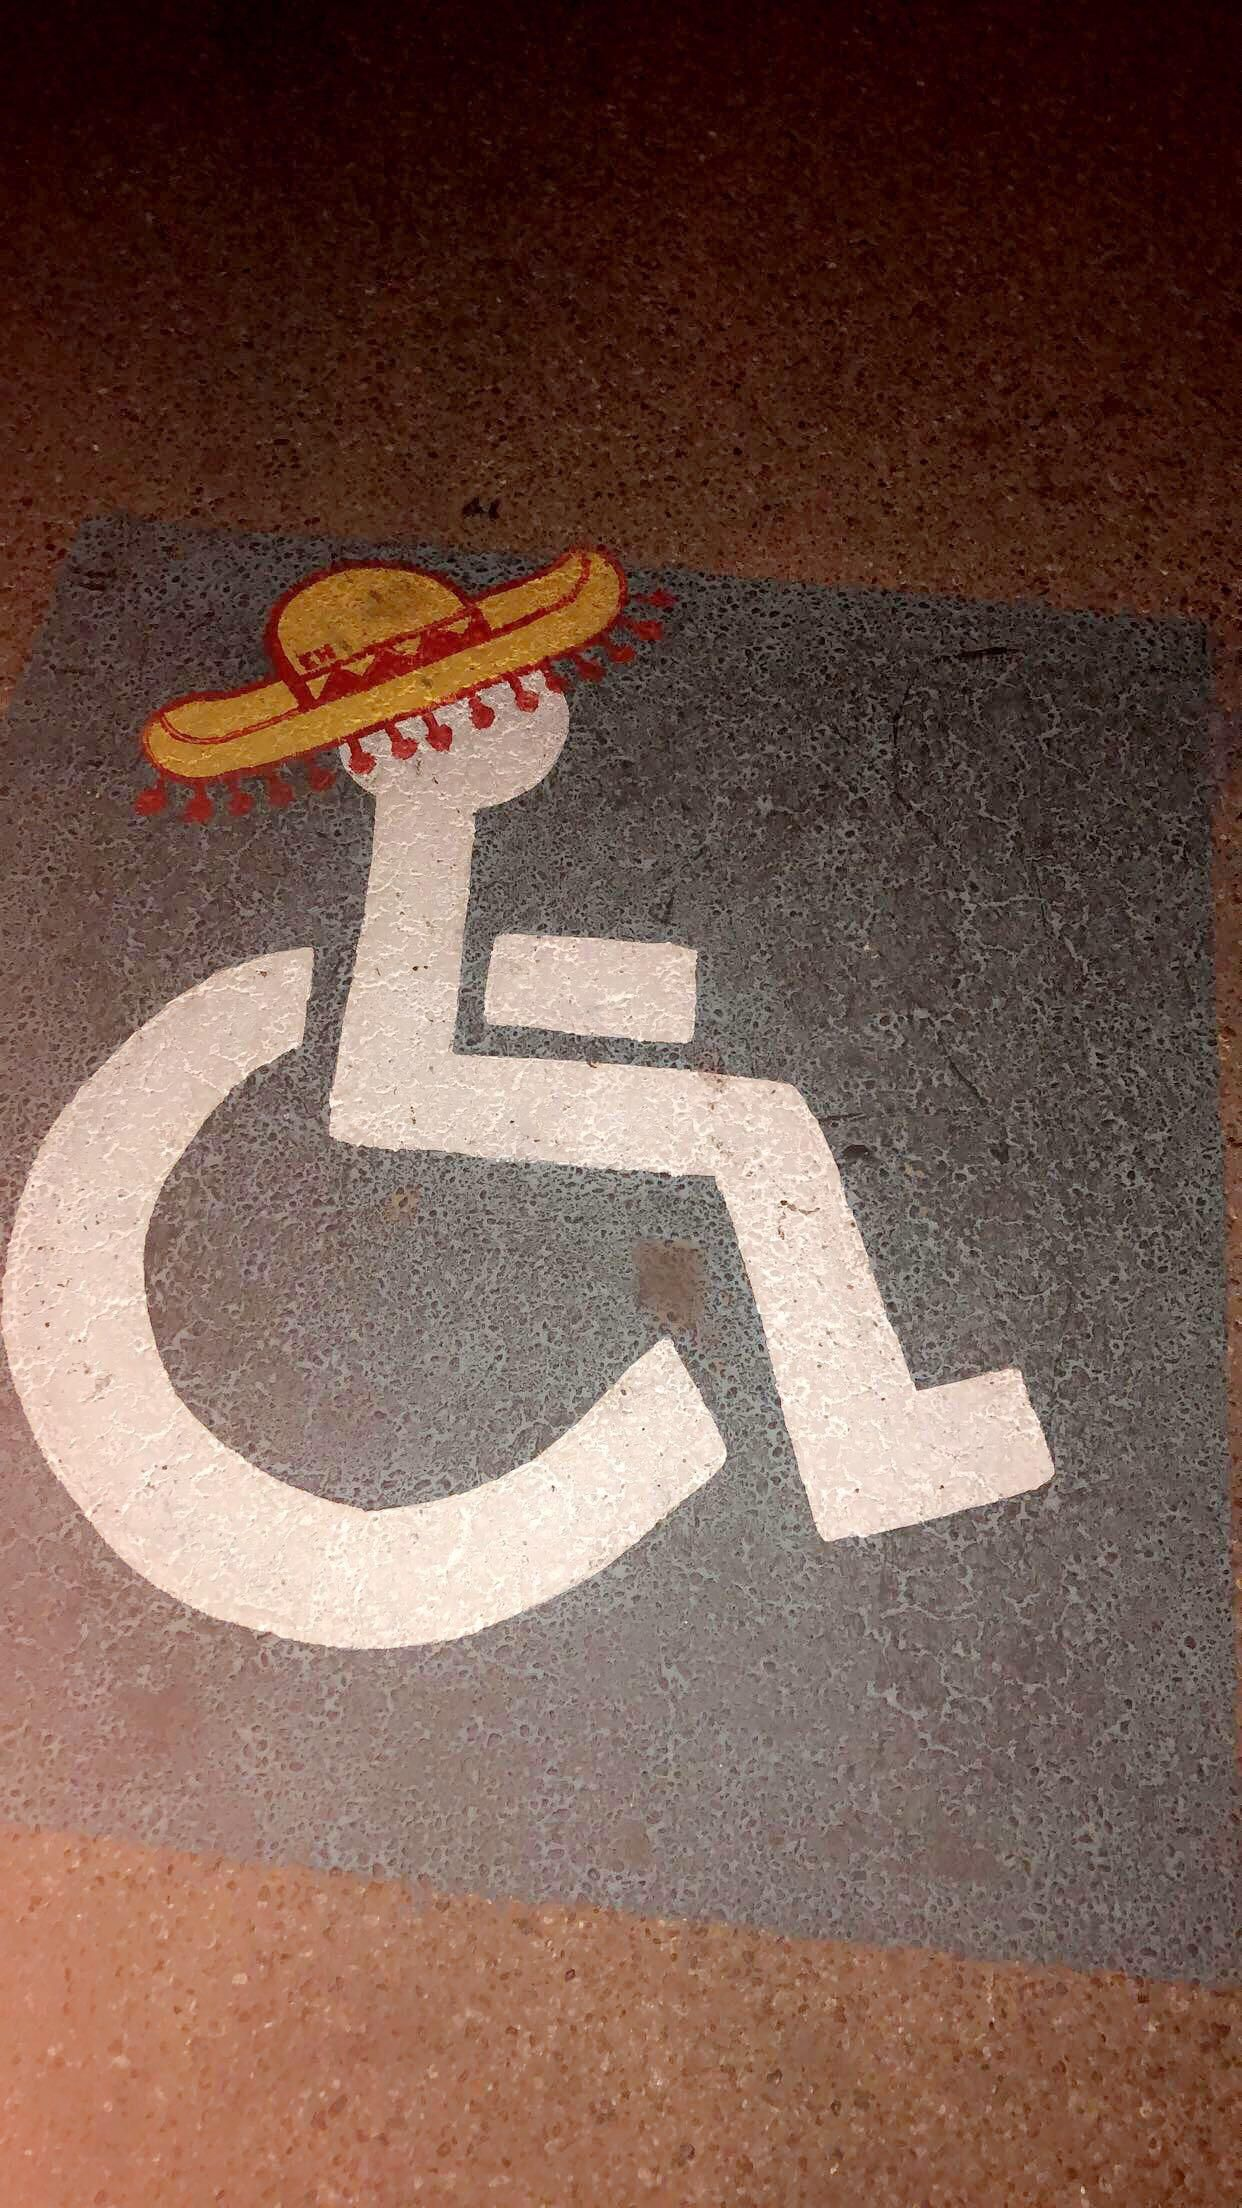 The handicap spots have sombreros at my local Mexican restaurant.